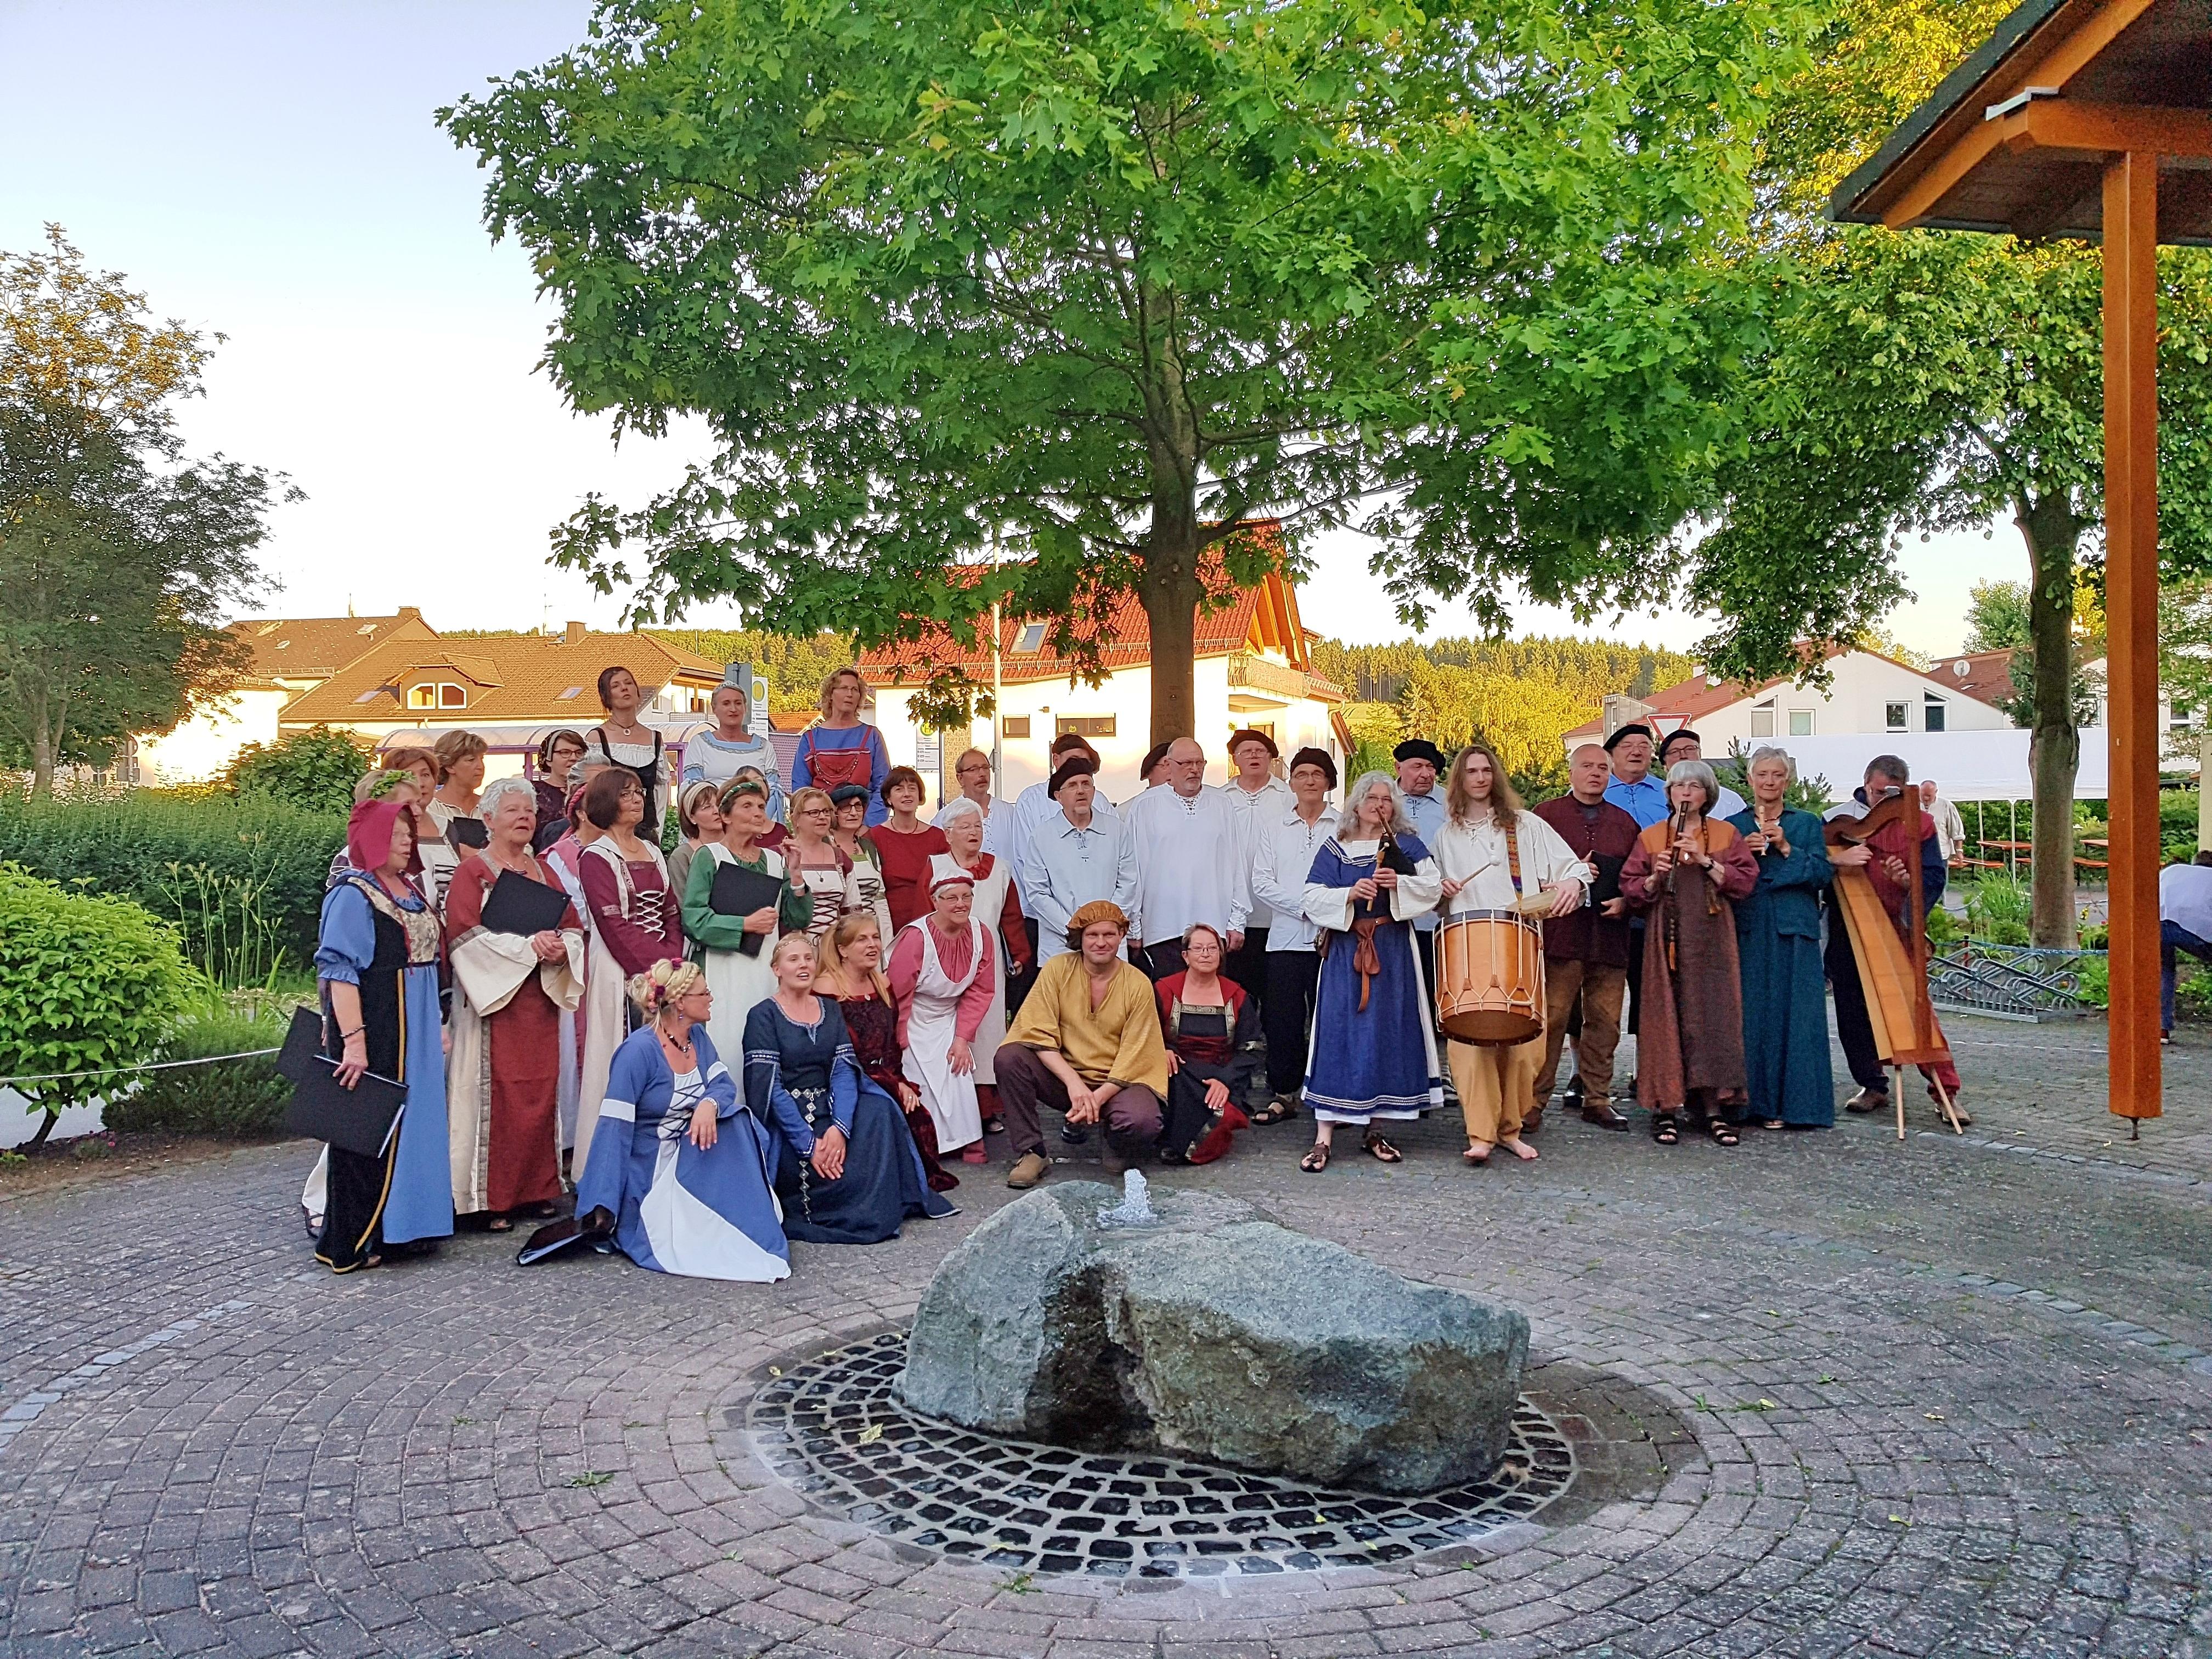 Mittelalter-Konzert